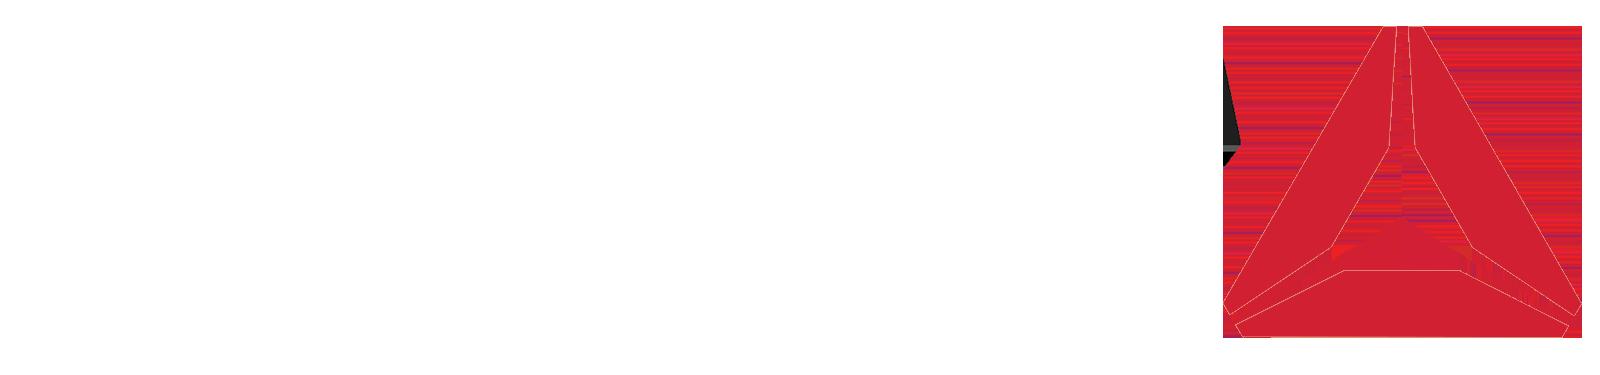 Reebok Png Reebok - SBNation.com